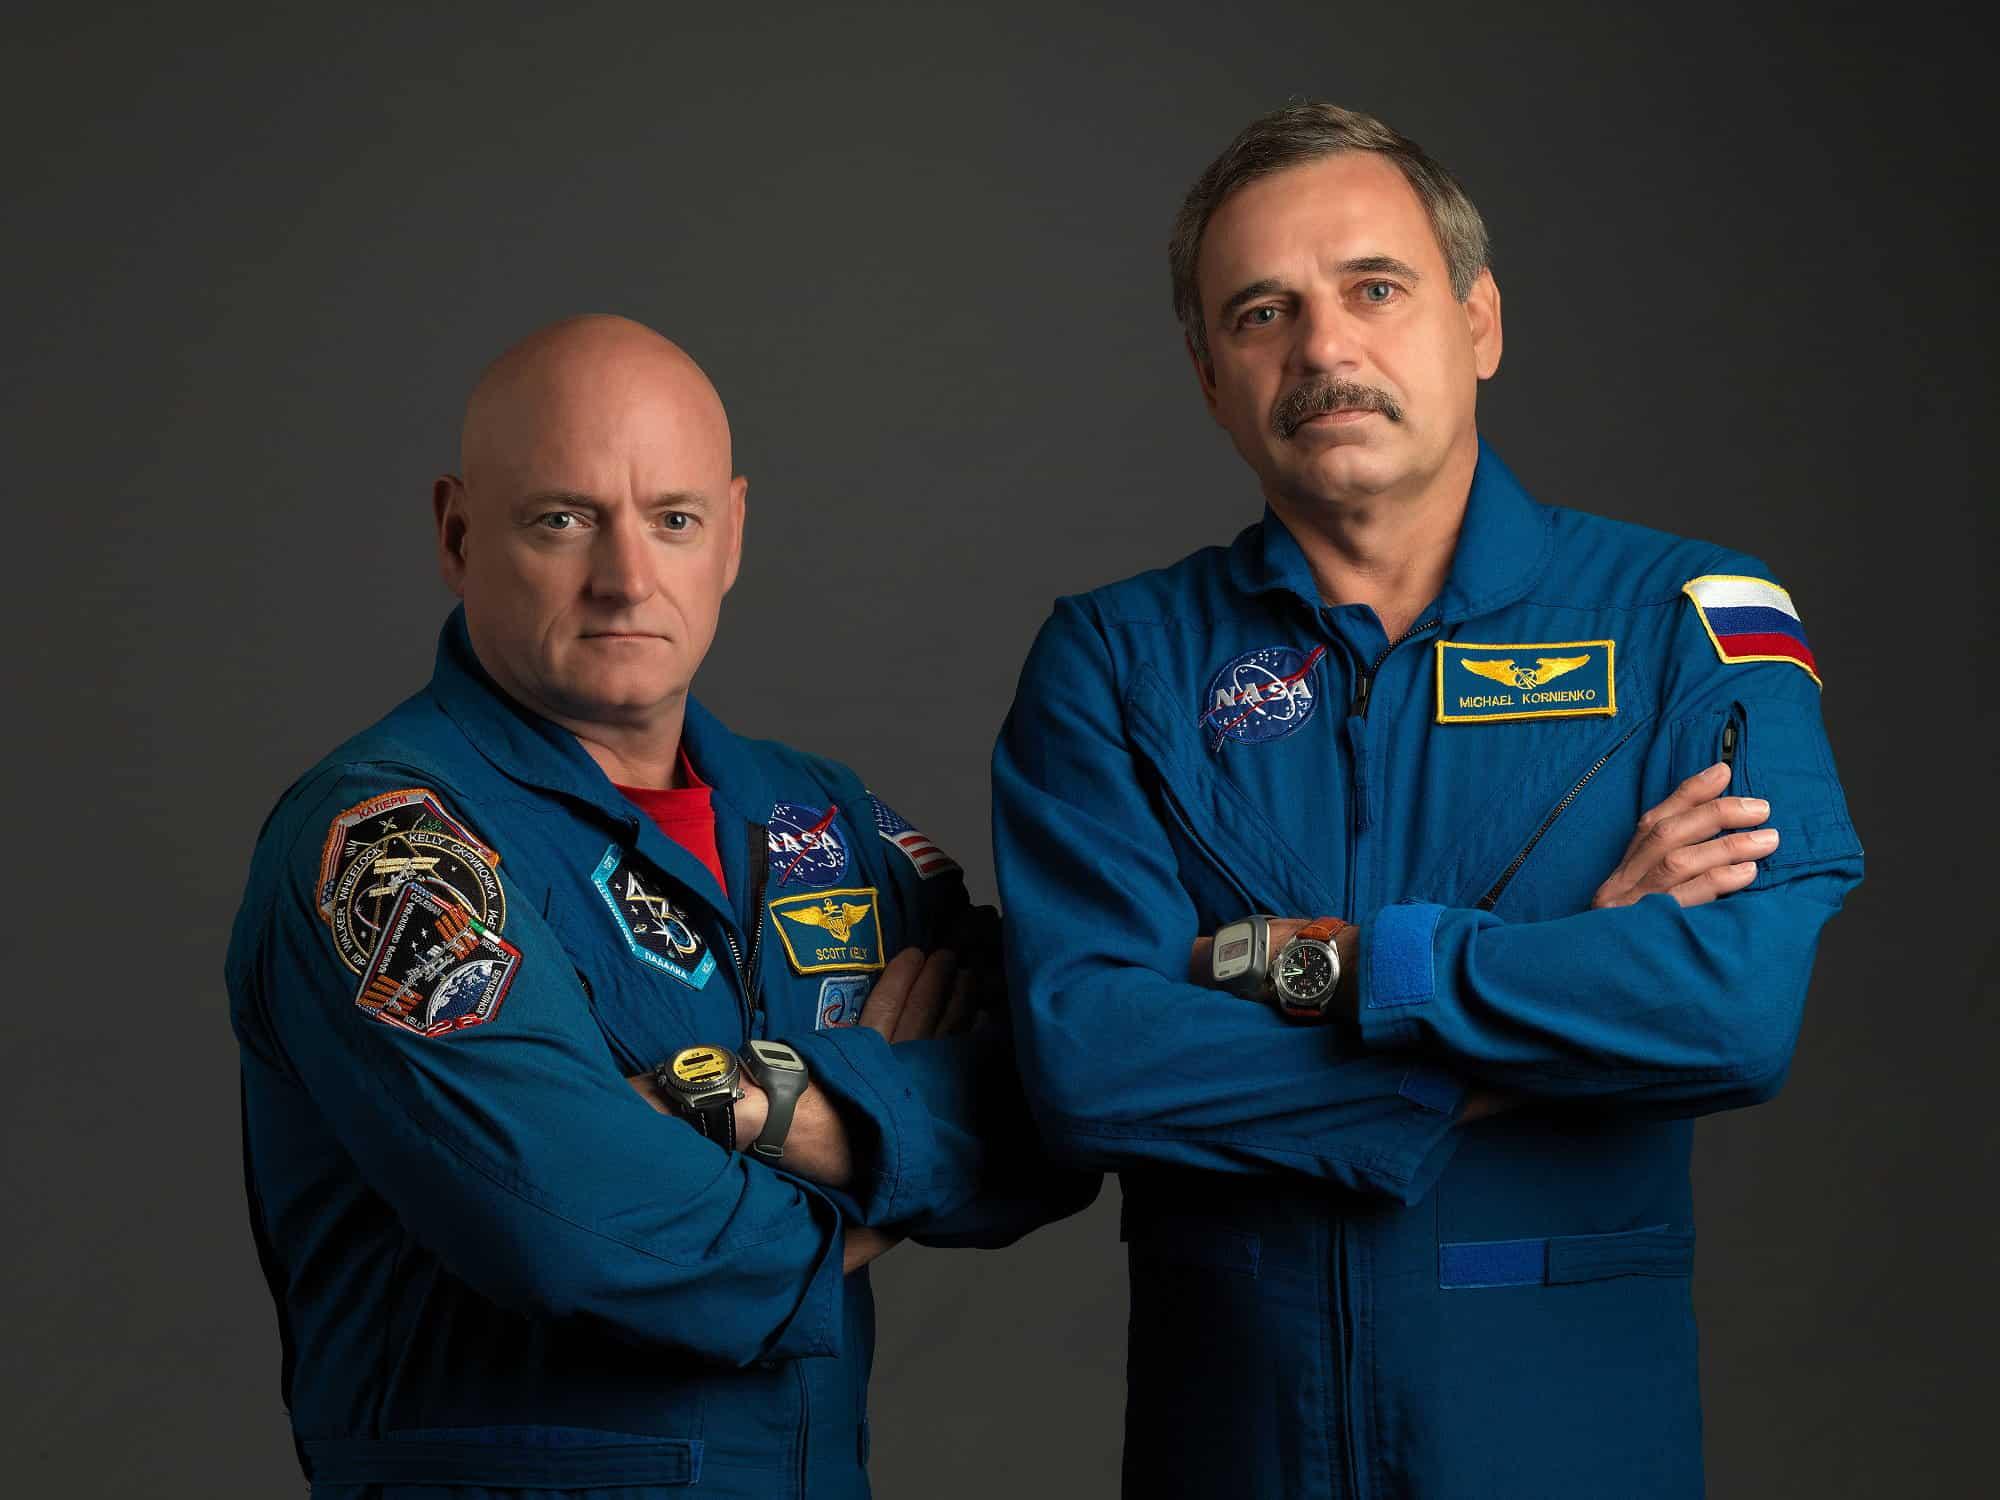 Астронавт Скотт Келли и космонавт Михаил Корниенко. Фото naked-science.ru